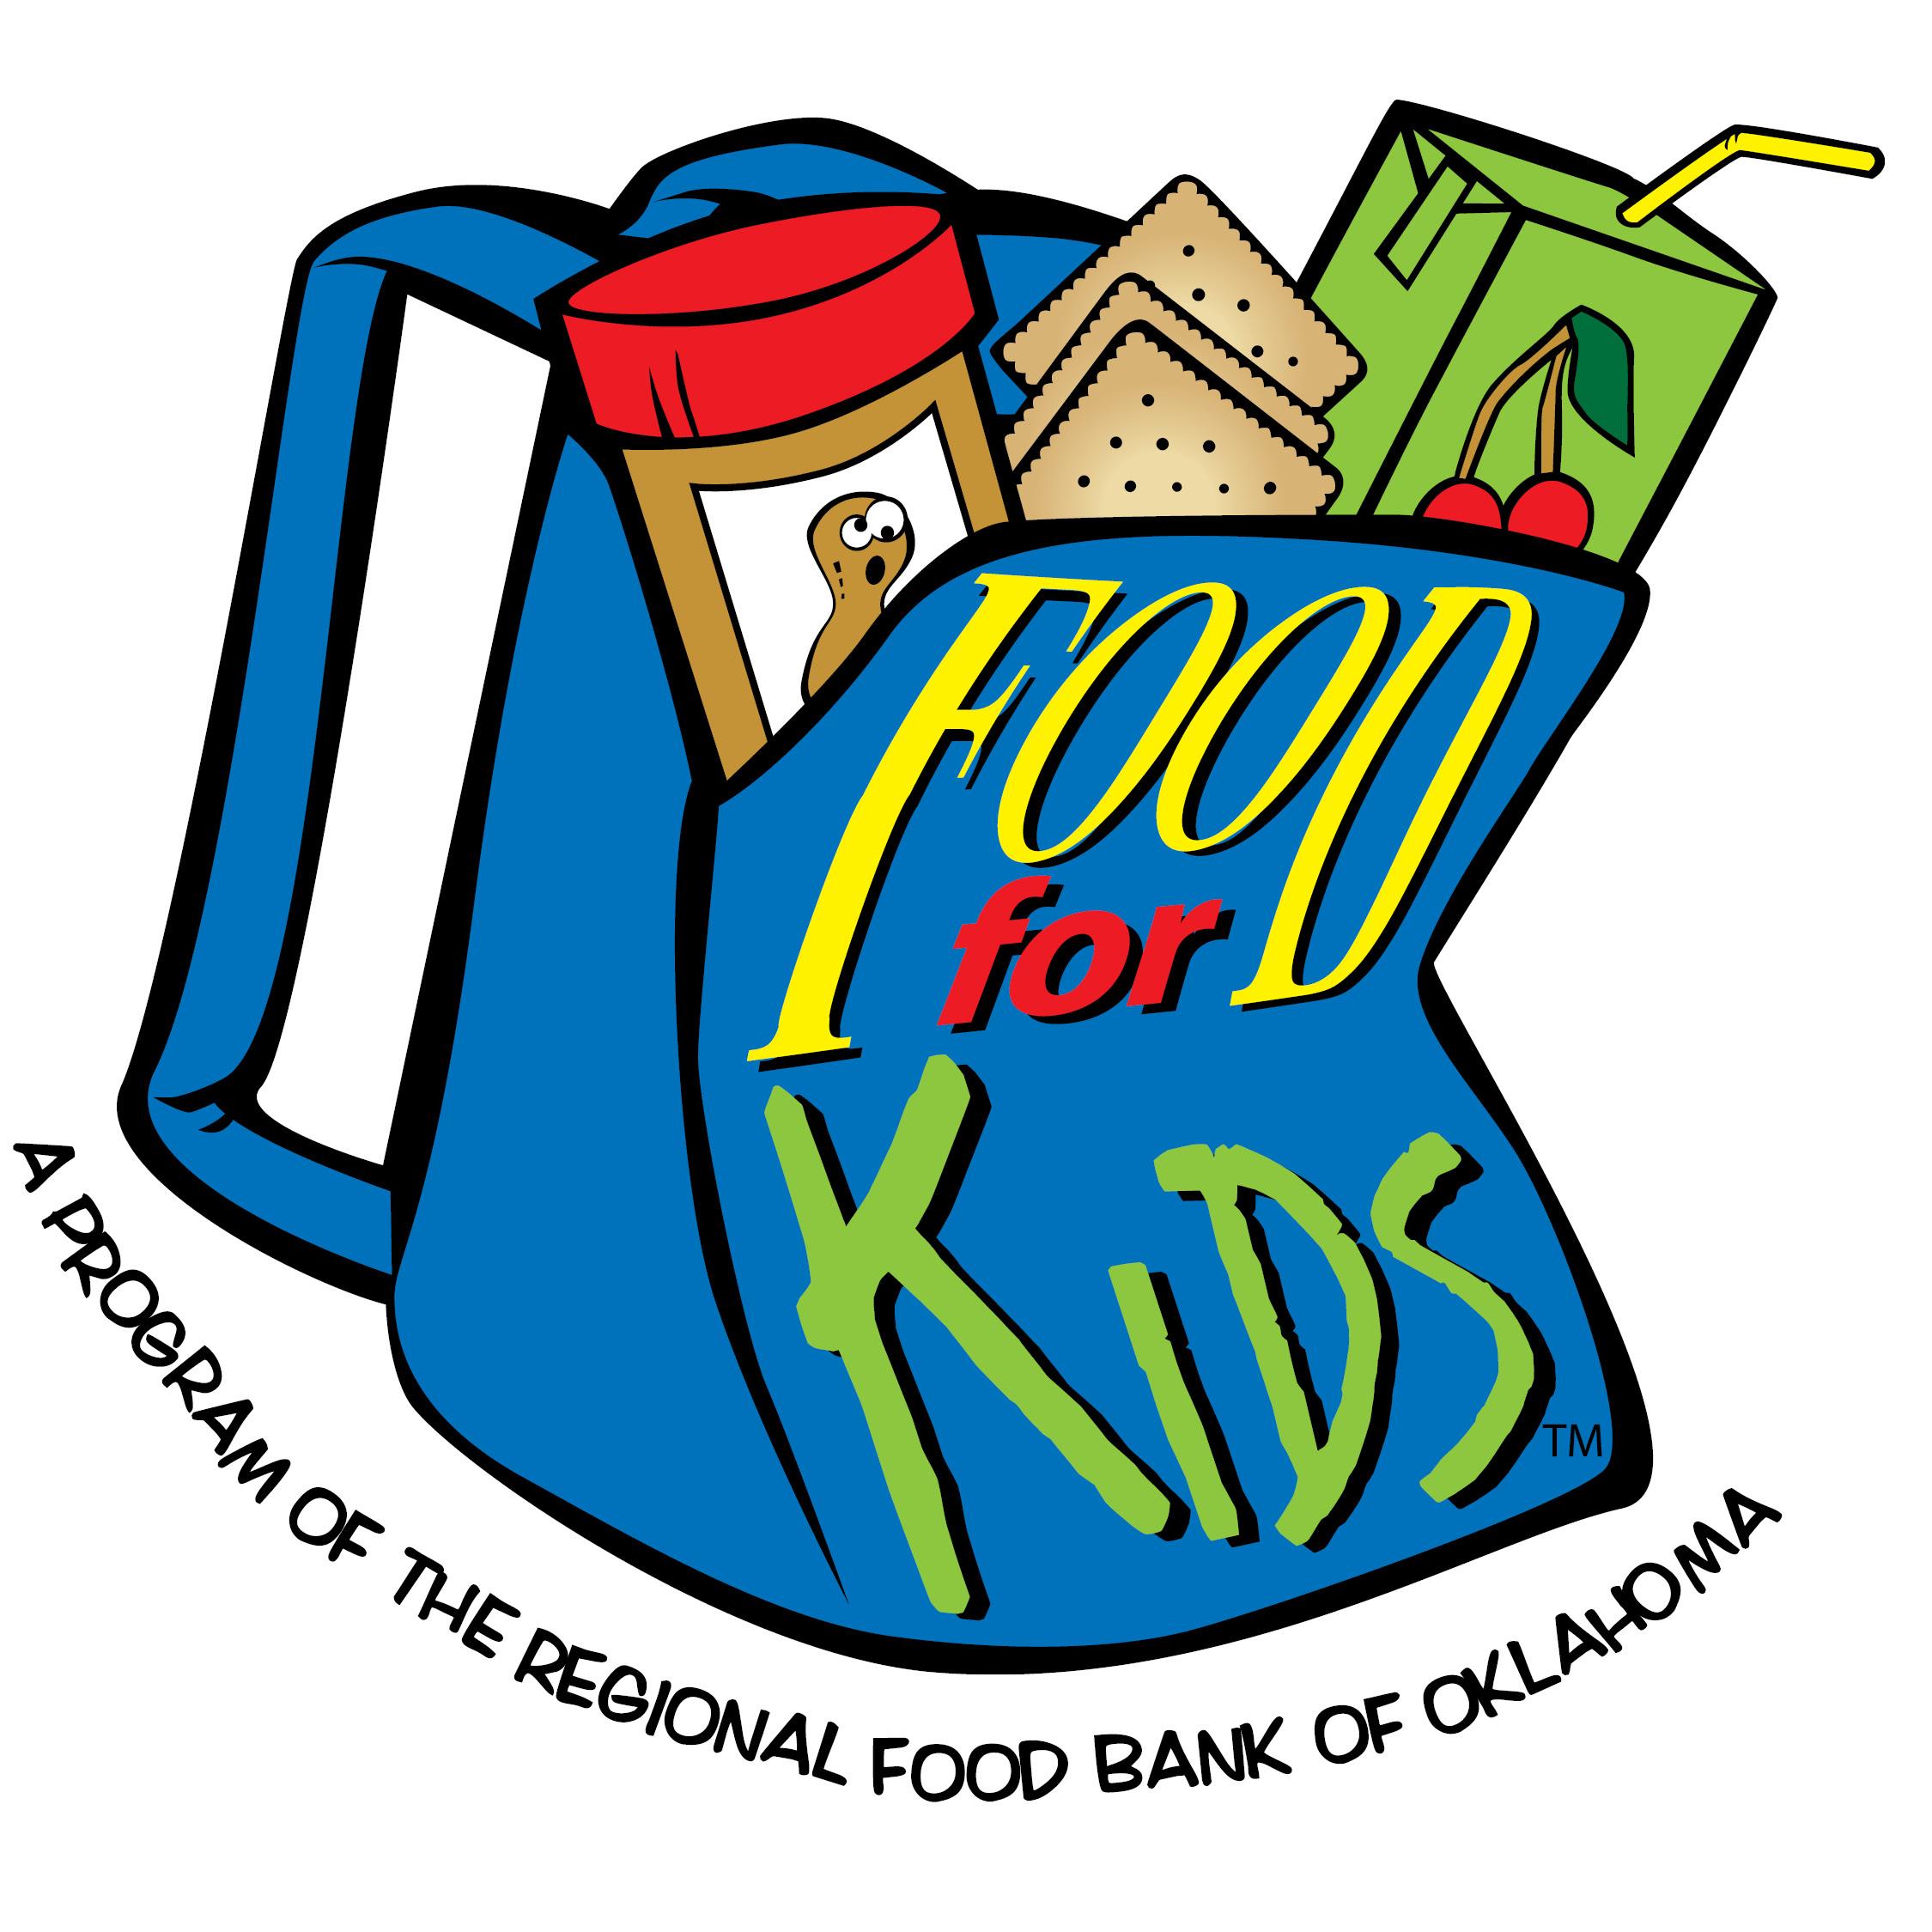 foodforkids-logo-new.jpg